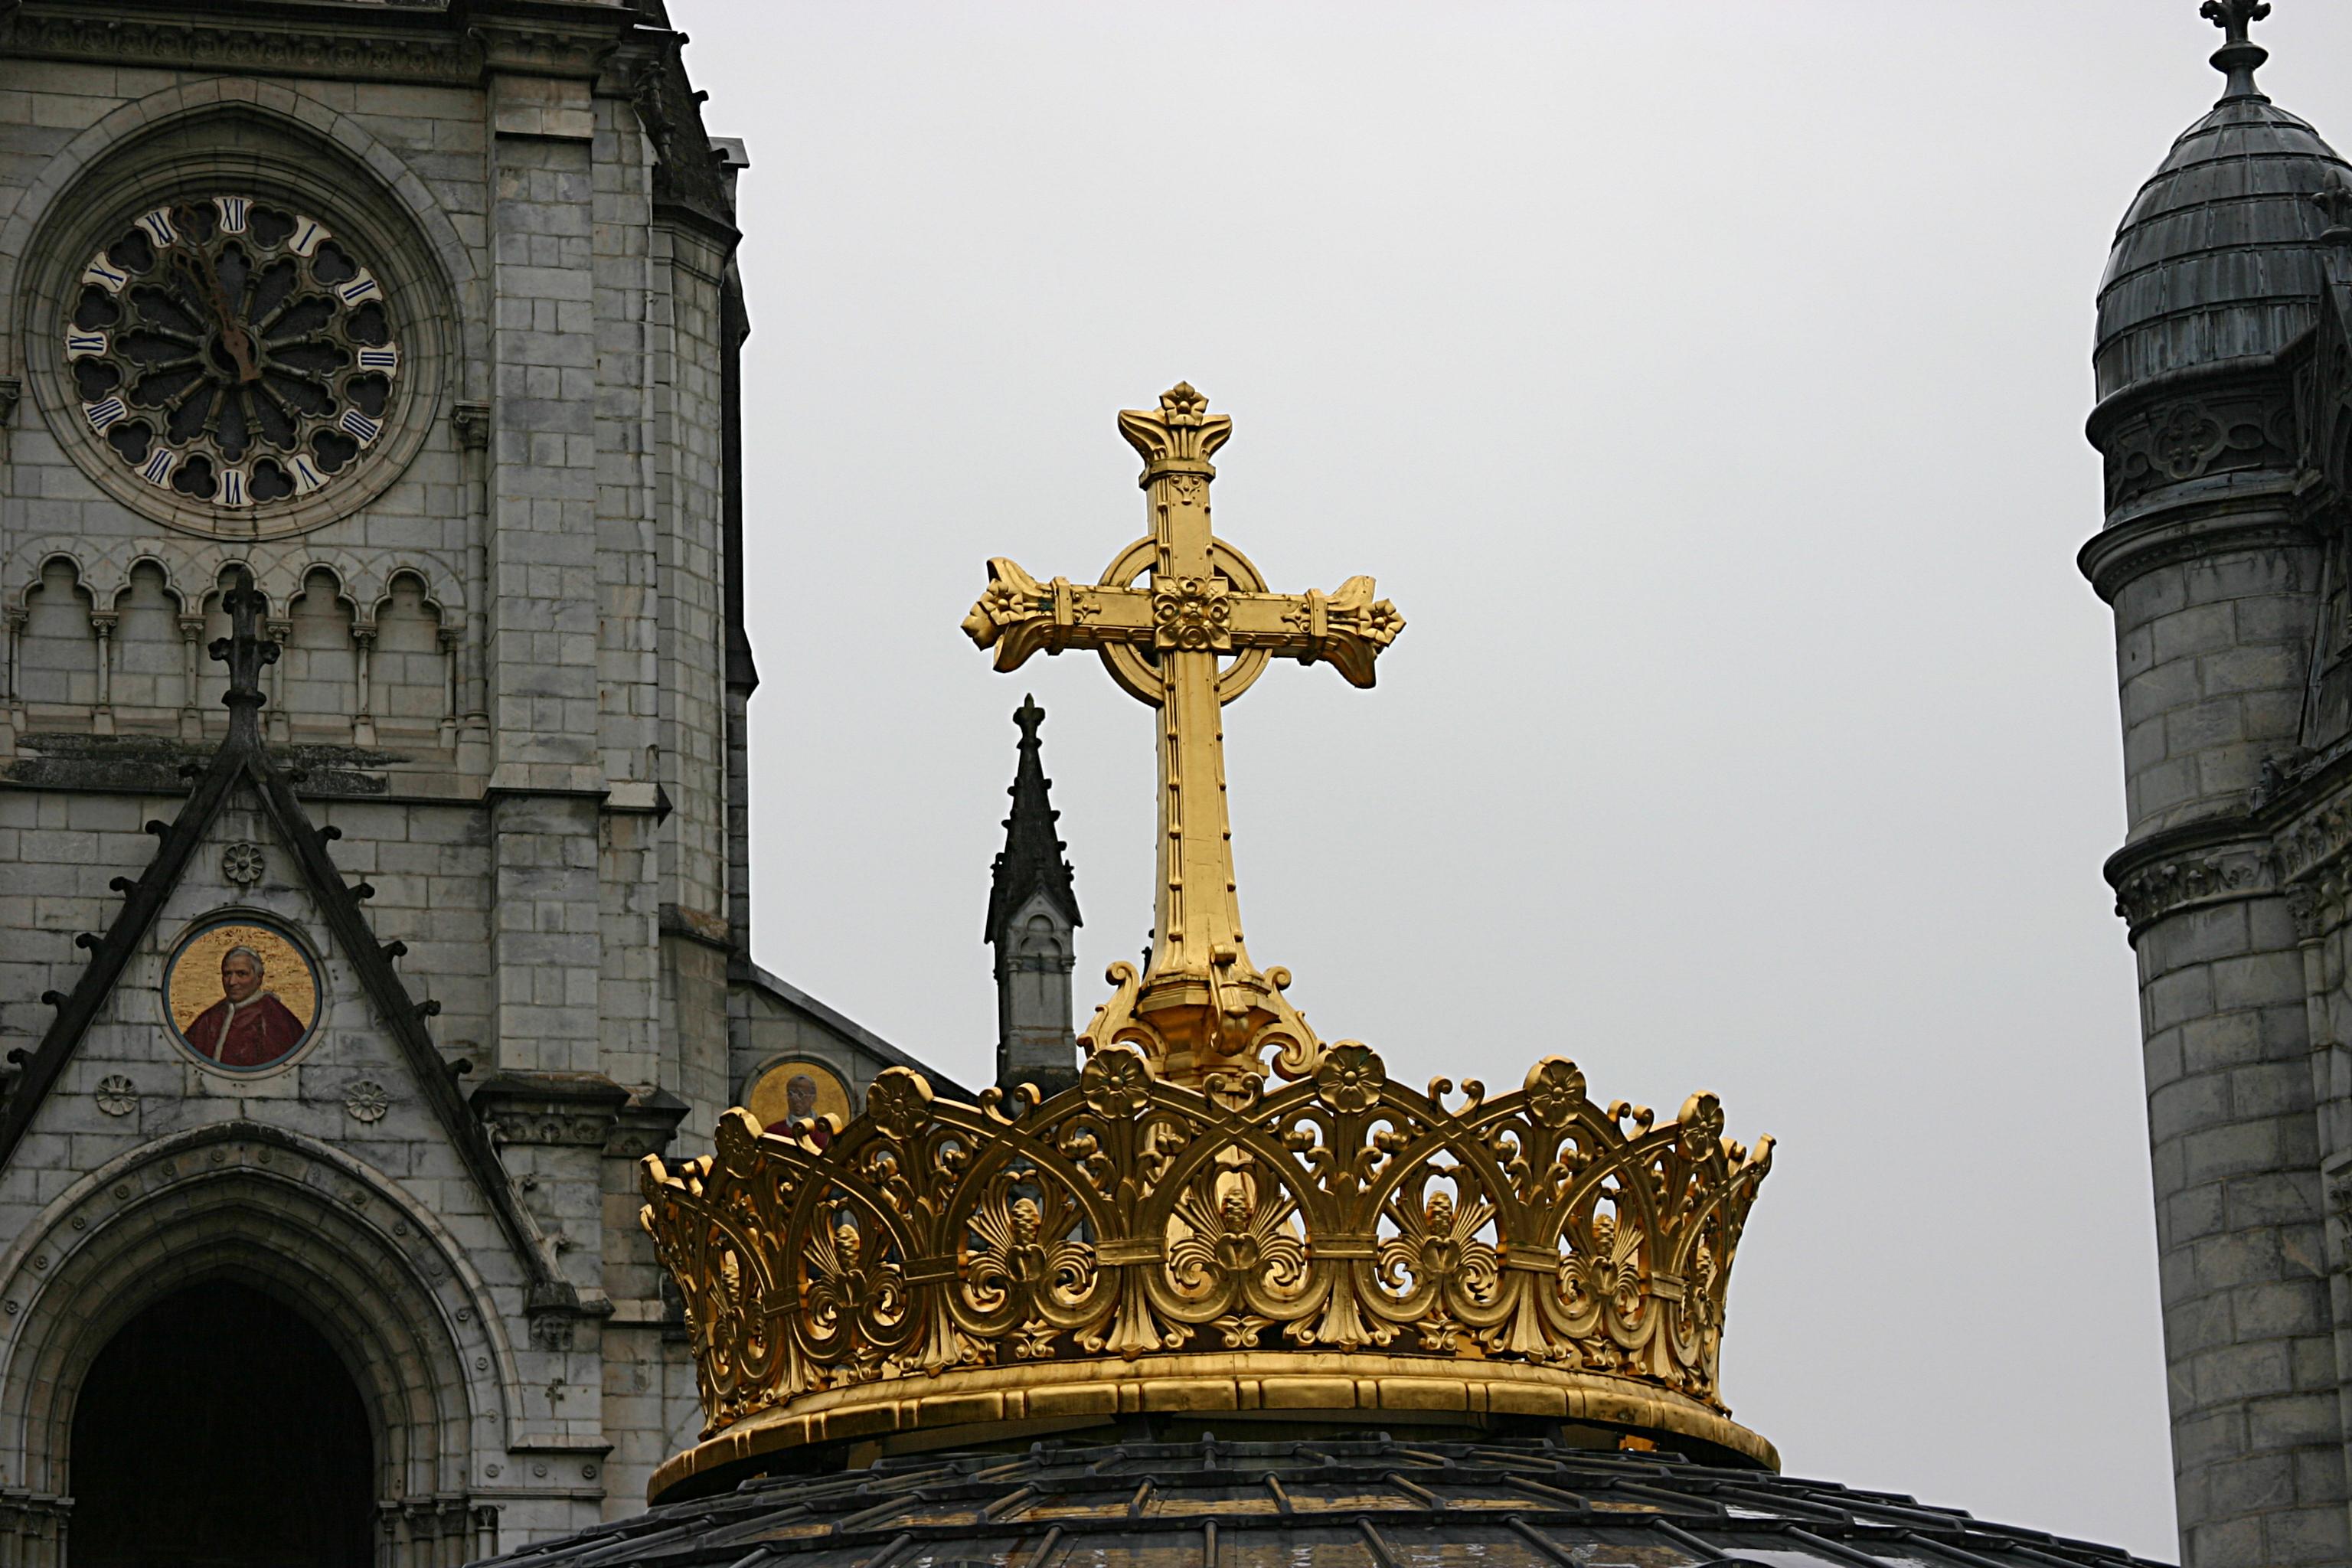 https://en.wikipedia.org/wiki/Rosary_Basilica